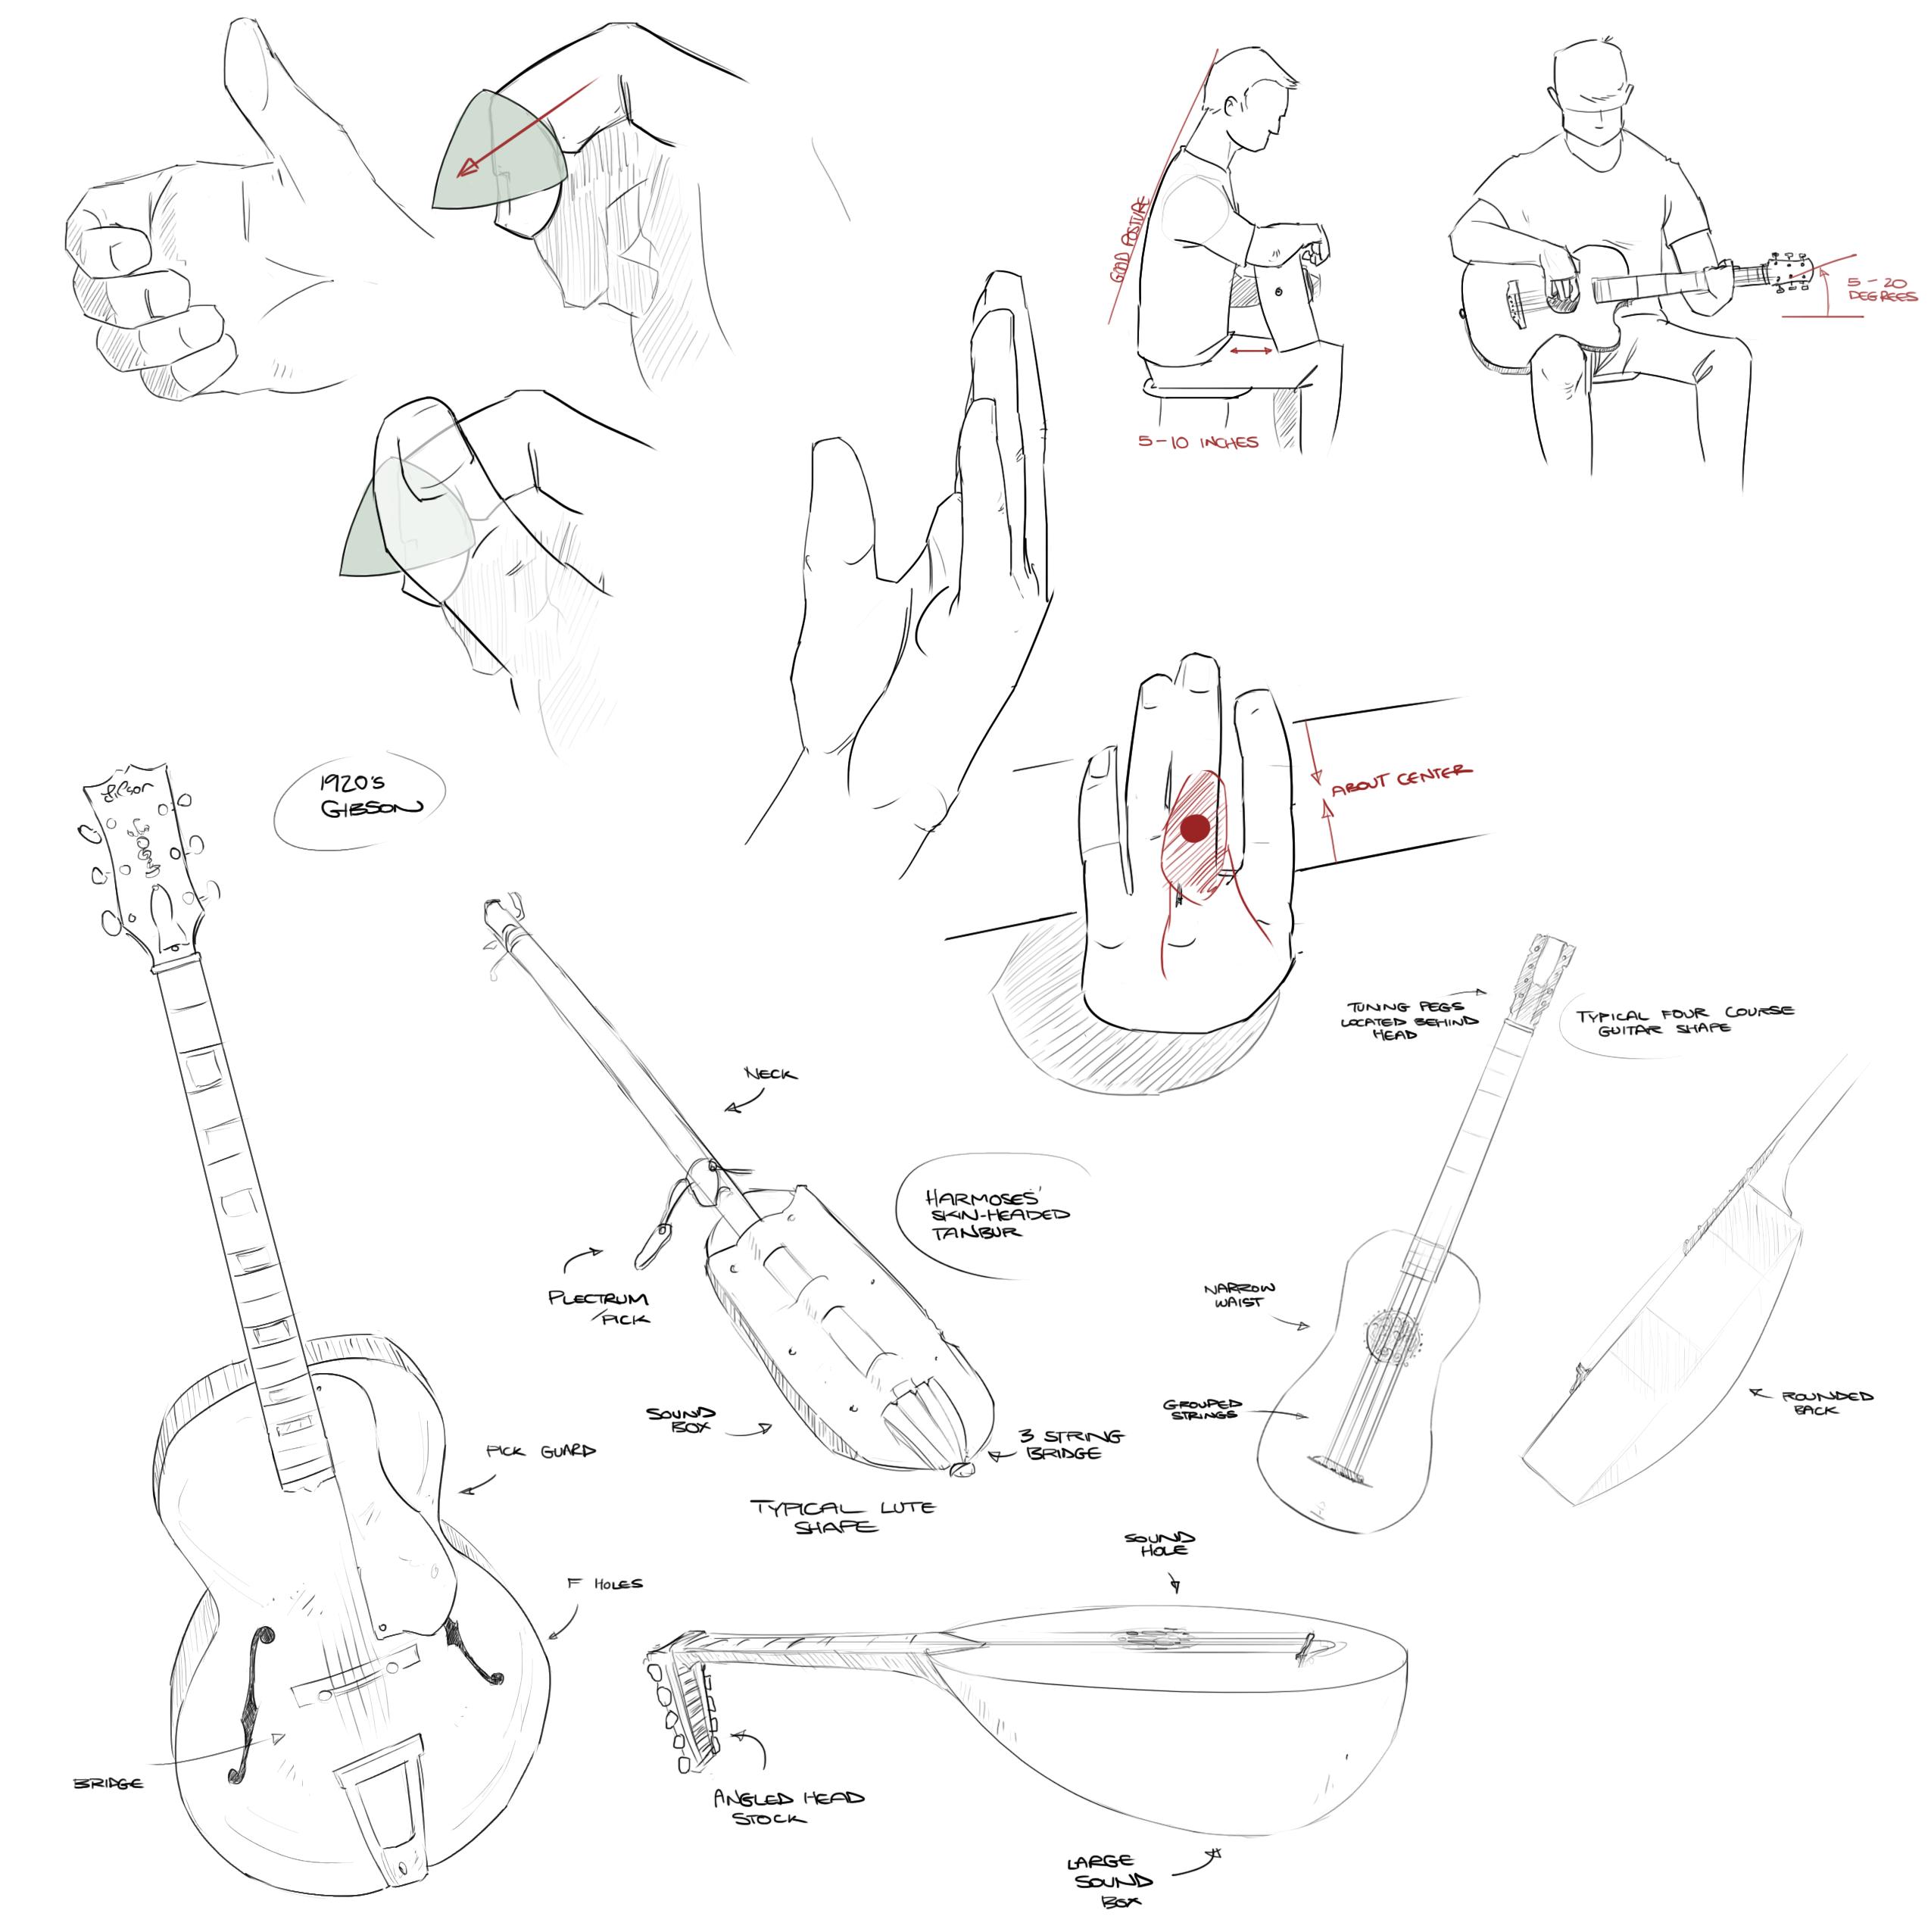 Halo Sheet Music With Lyrics: PZ C: Guitar Images